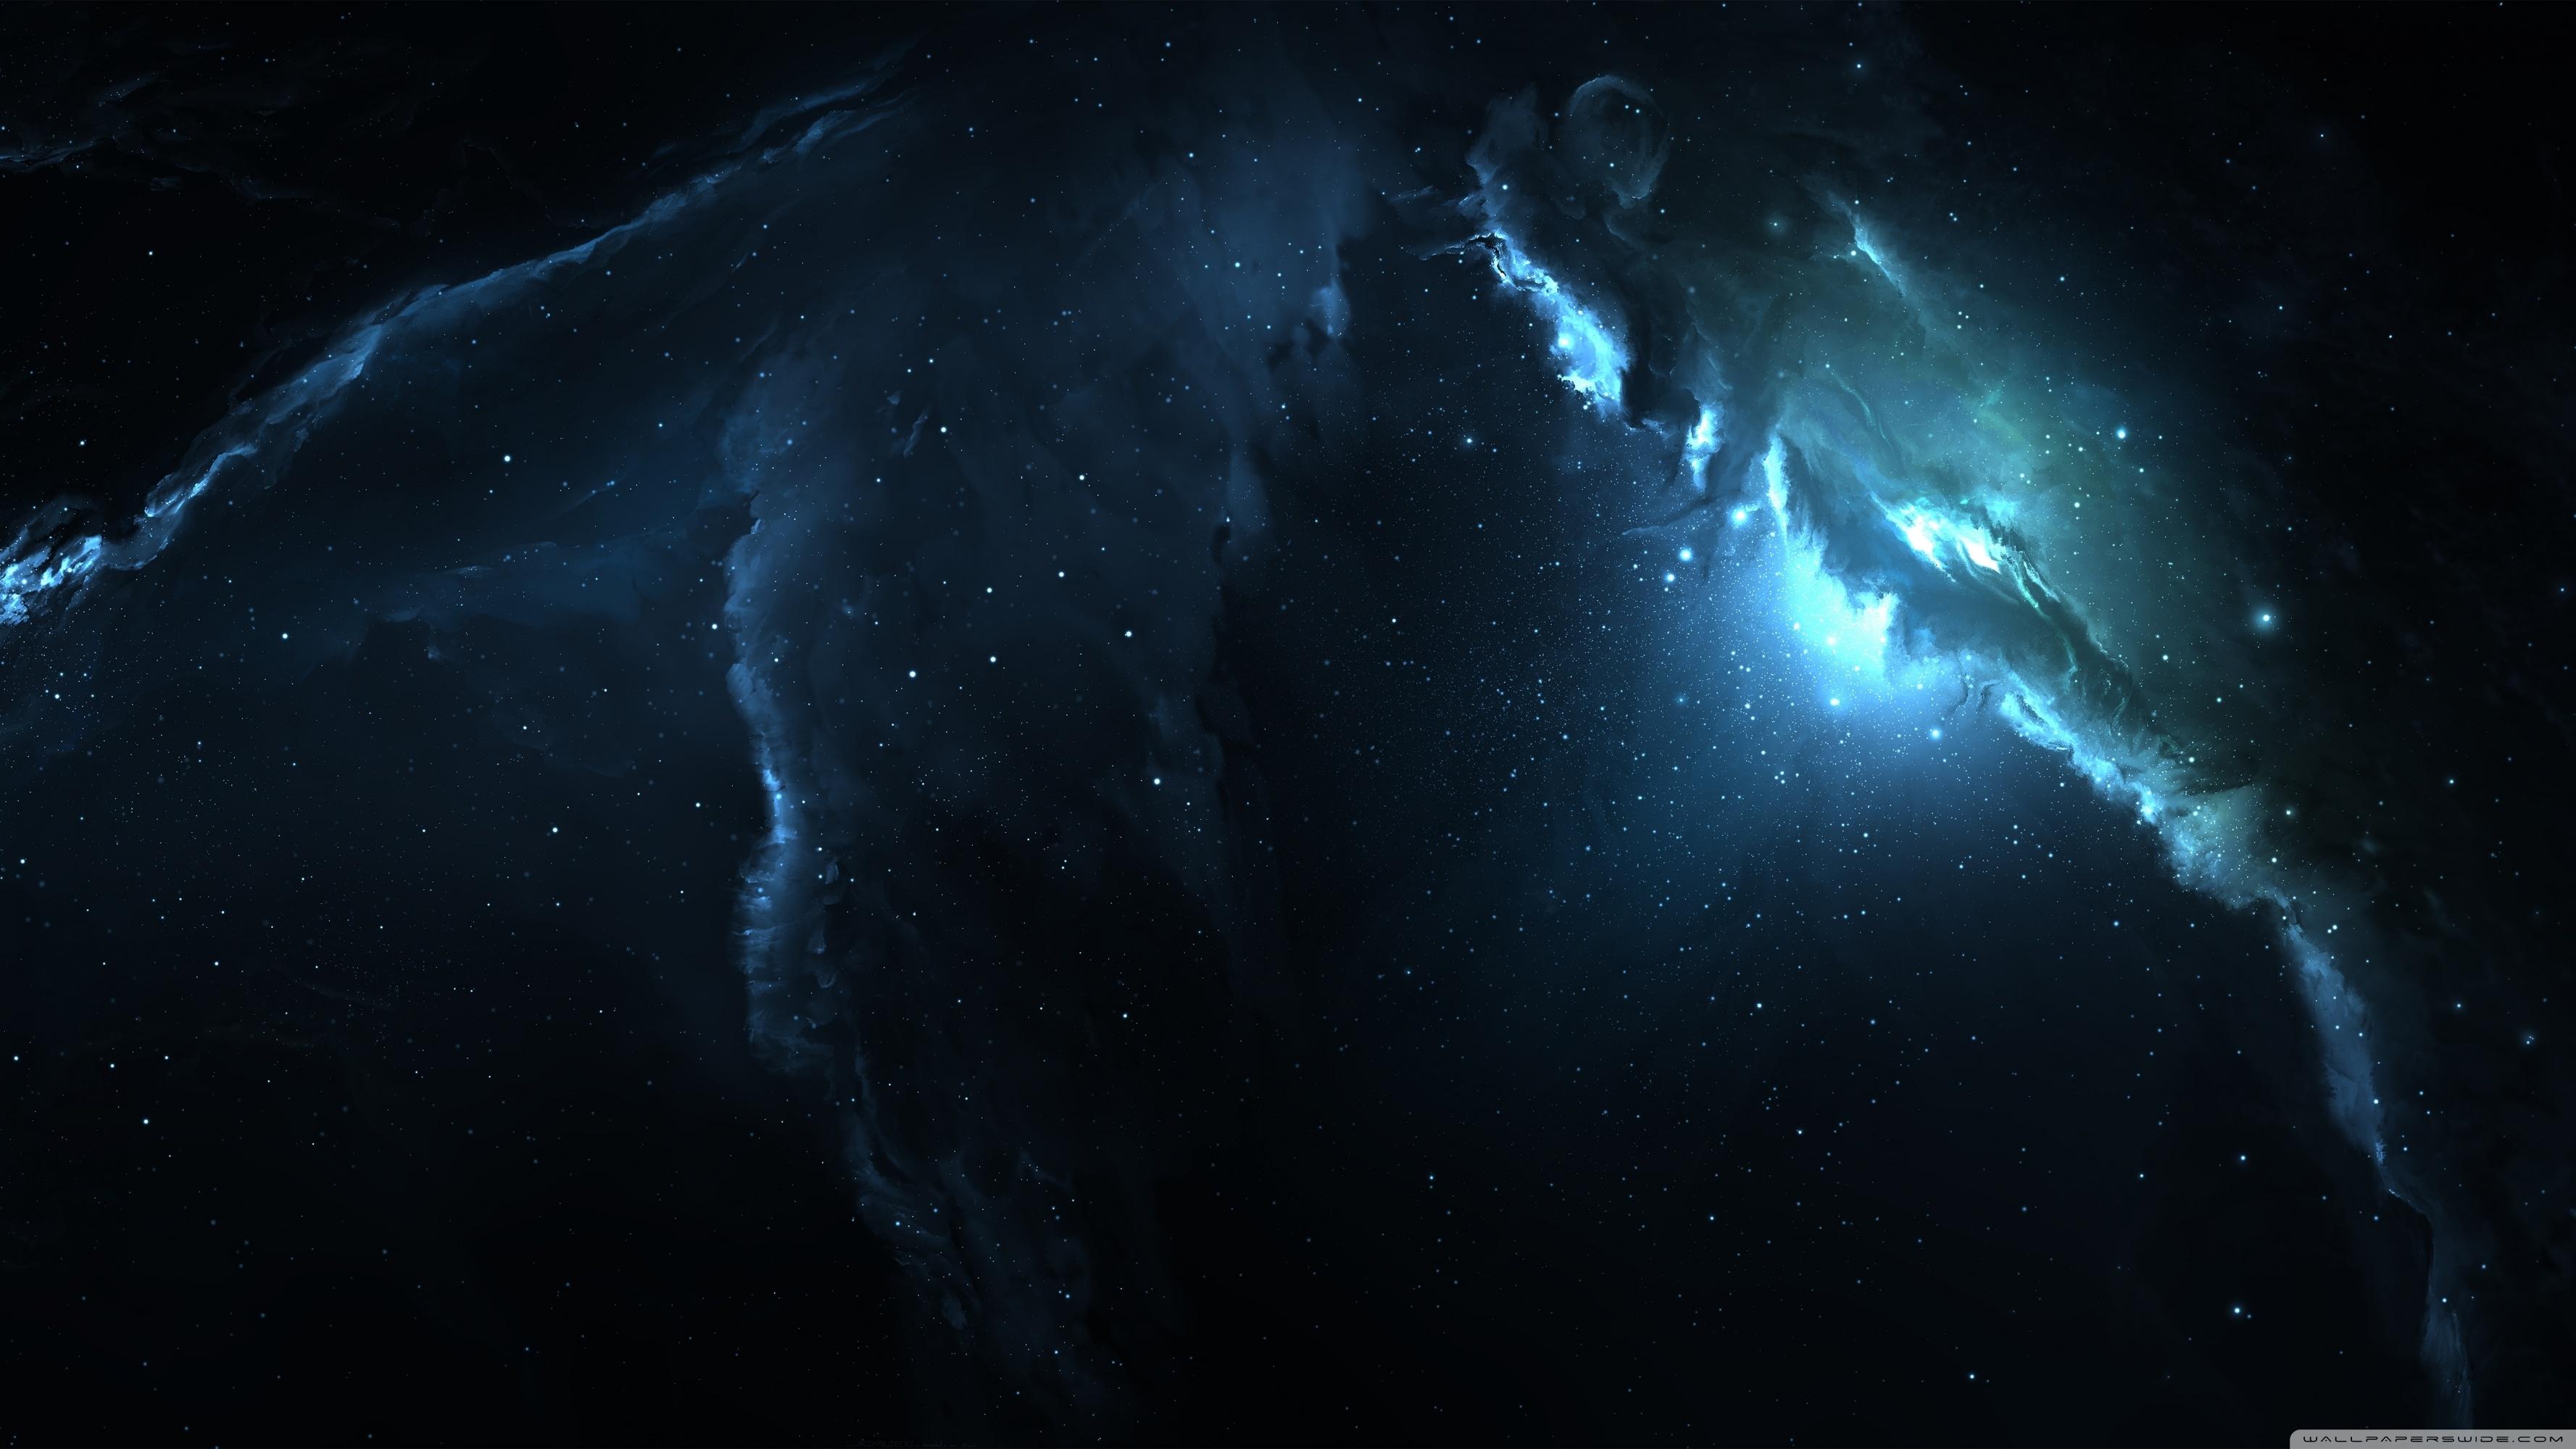 atlantis nebula #3 dual monitor ❤ 4k hd desktop wallpaper for 4k